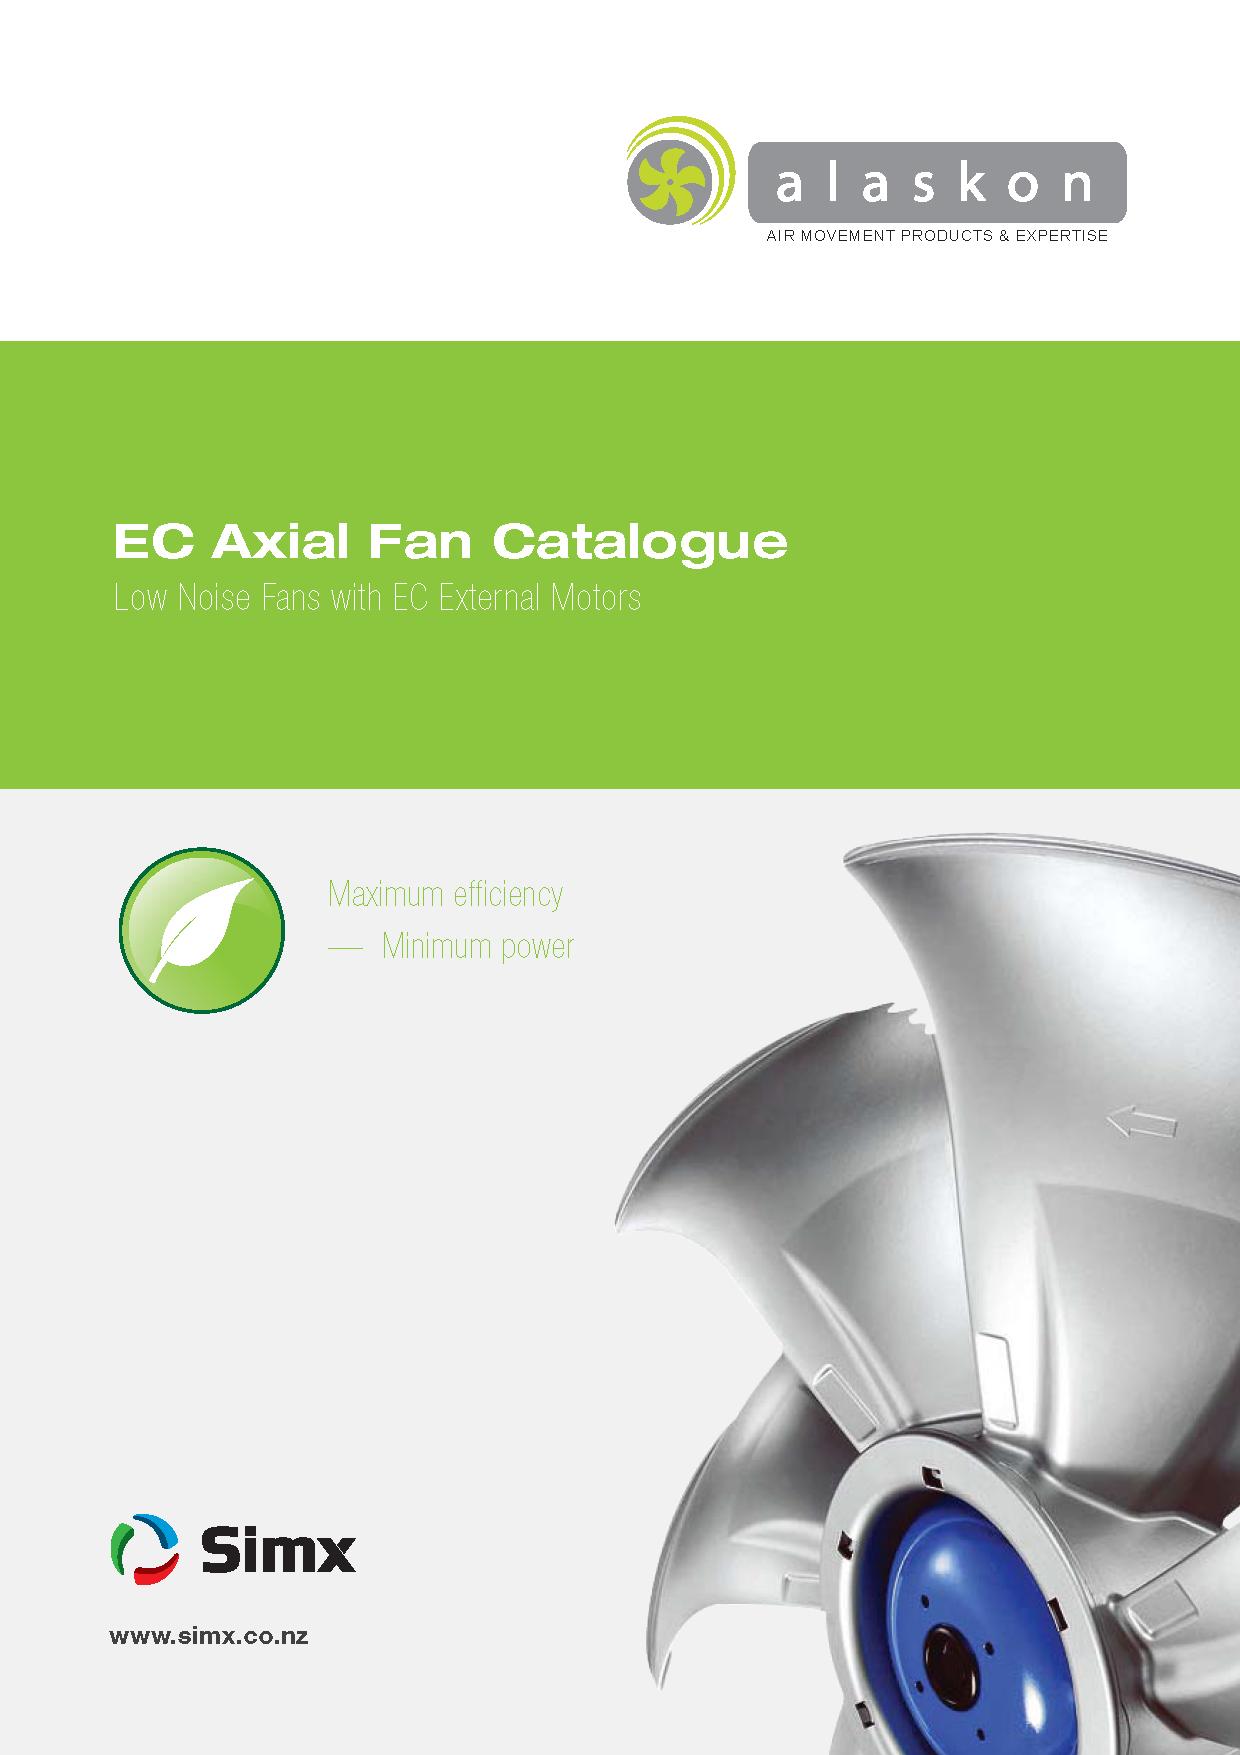 EC Axial Fan Catalogue